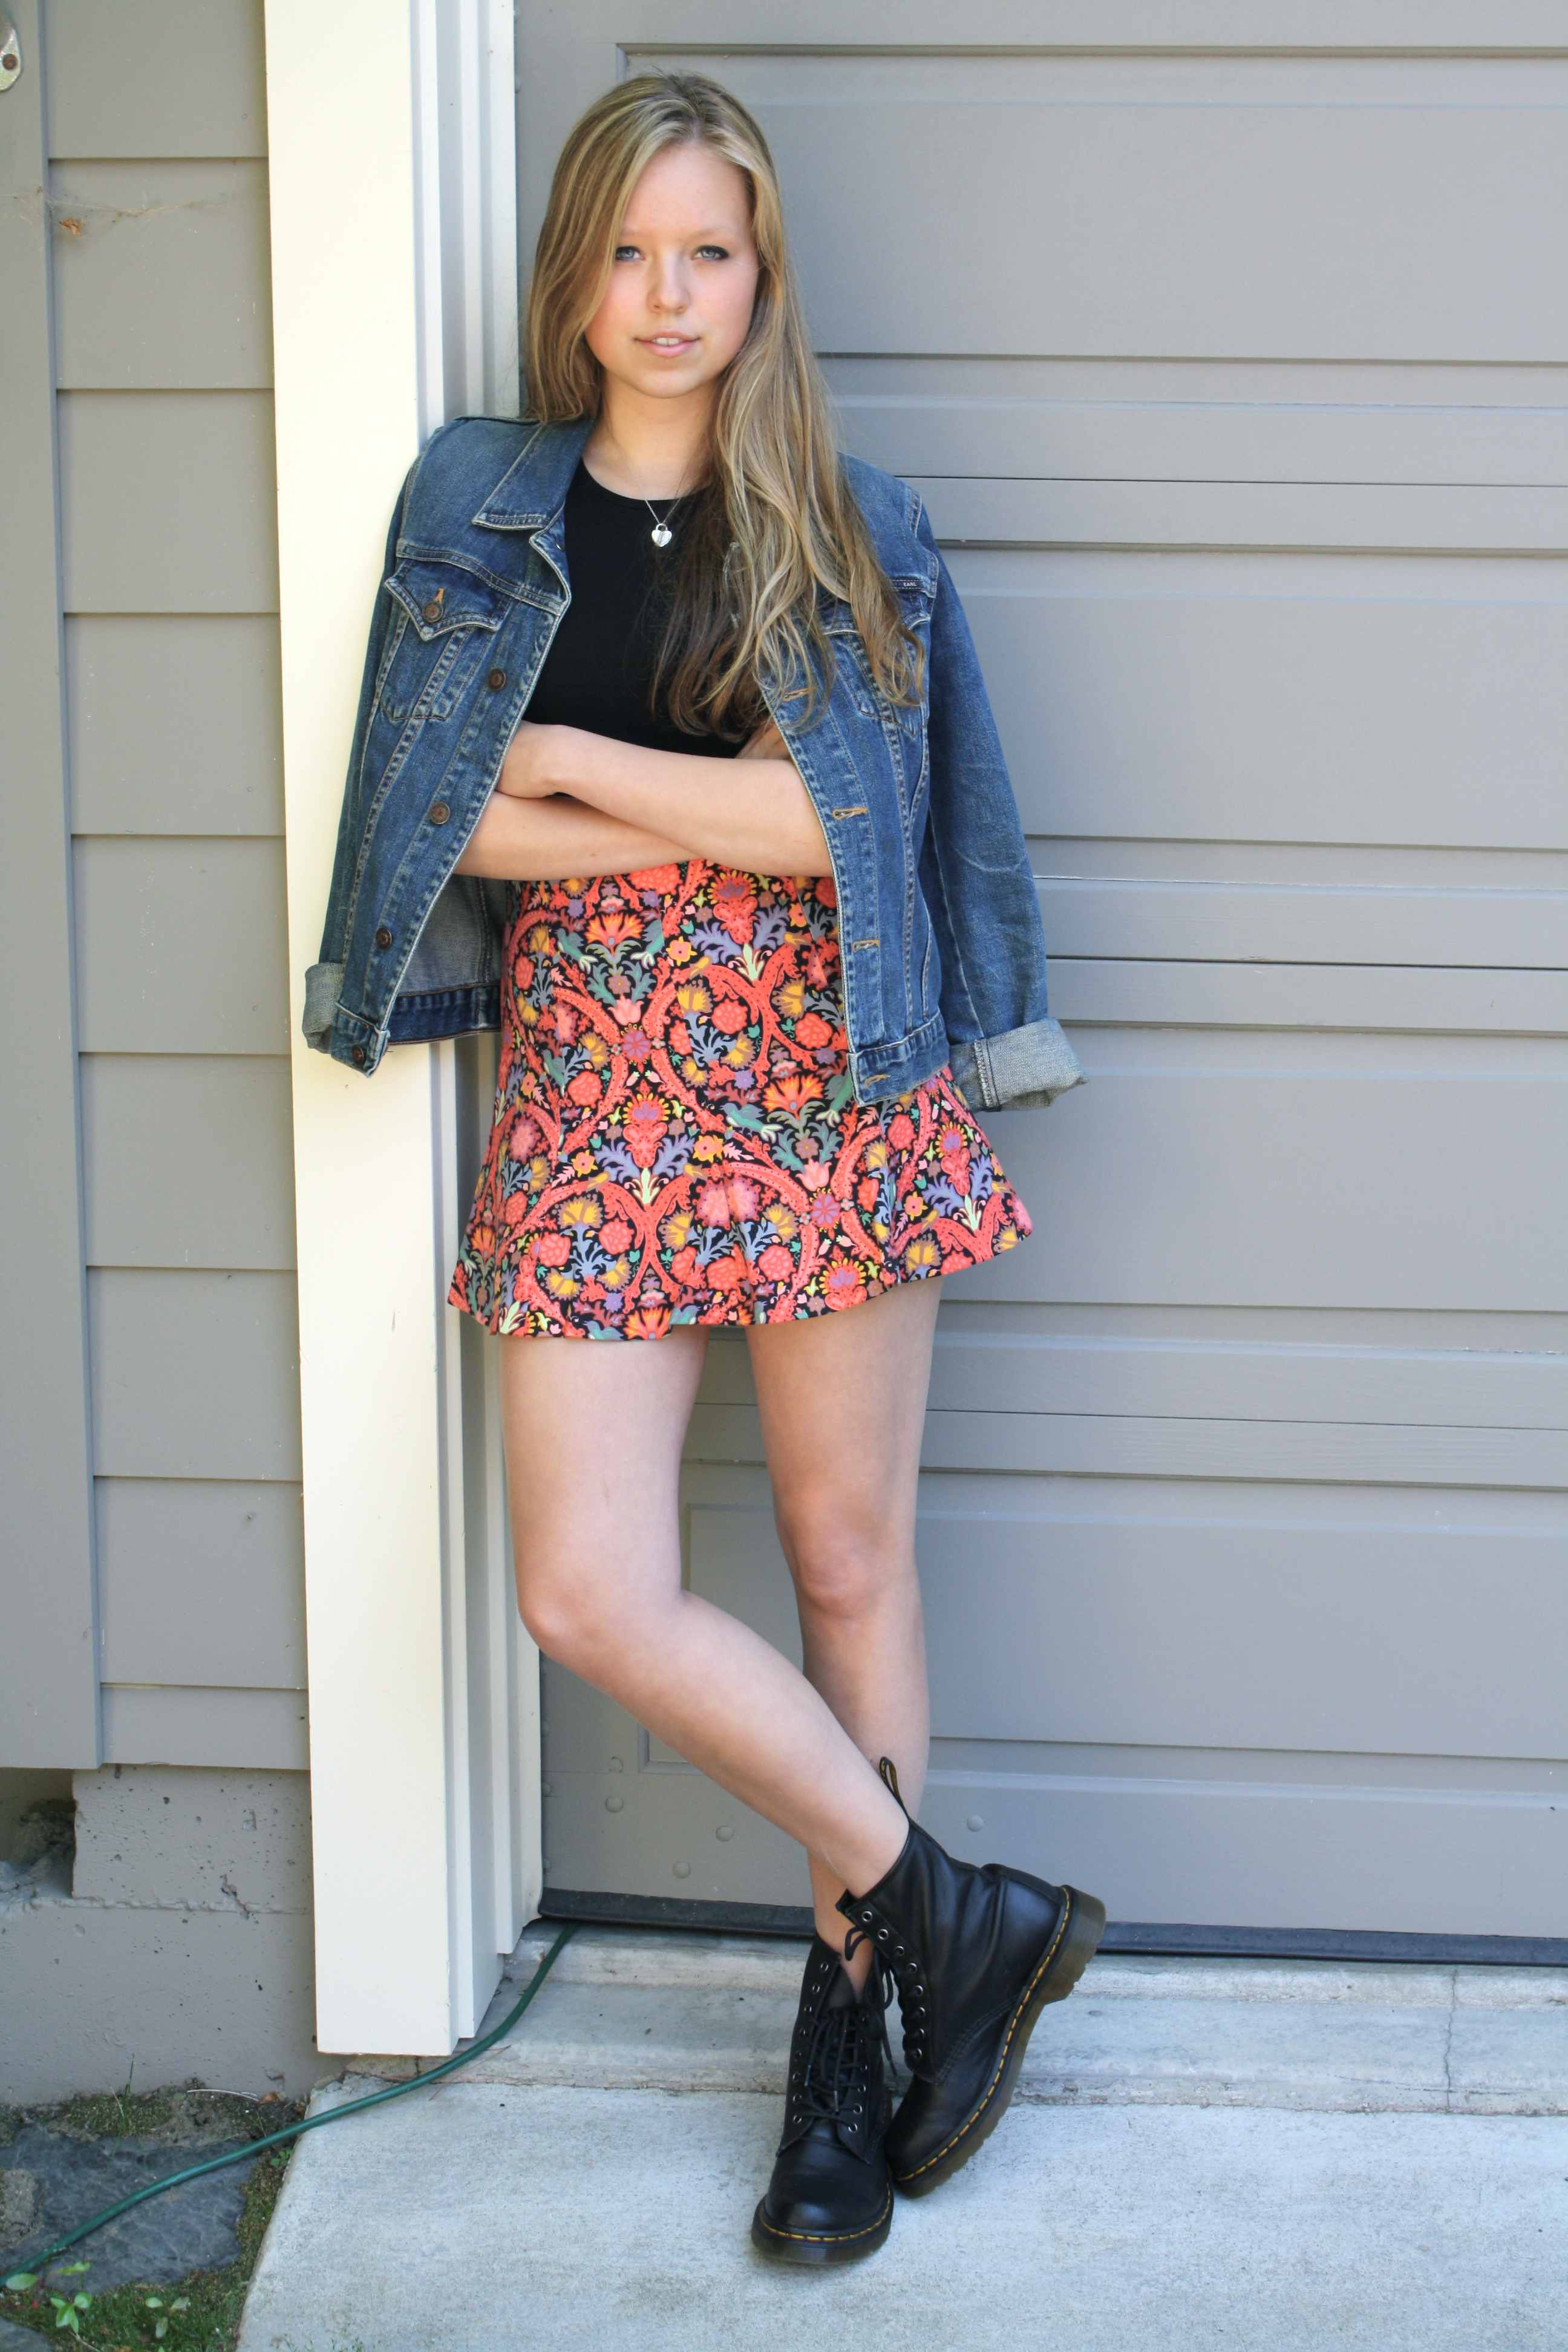 teen short skirt picture